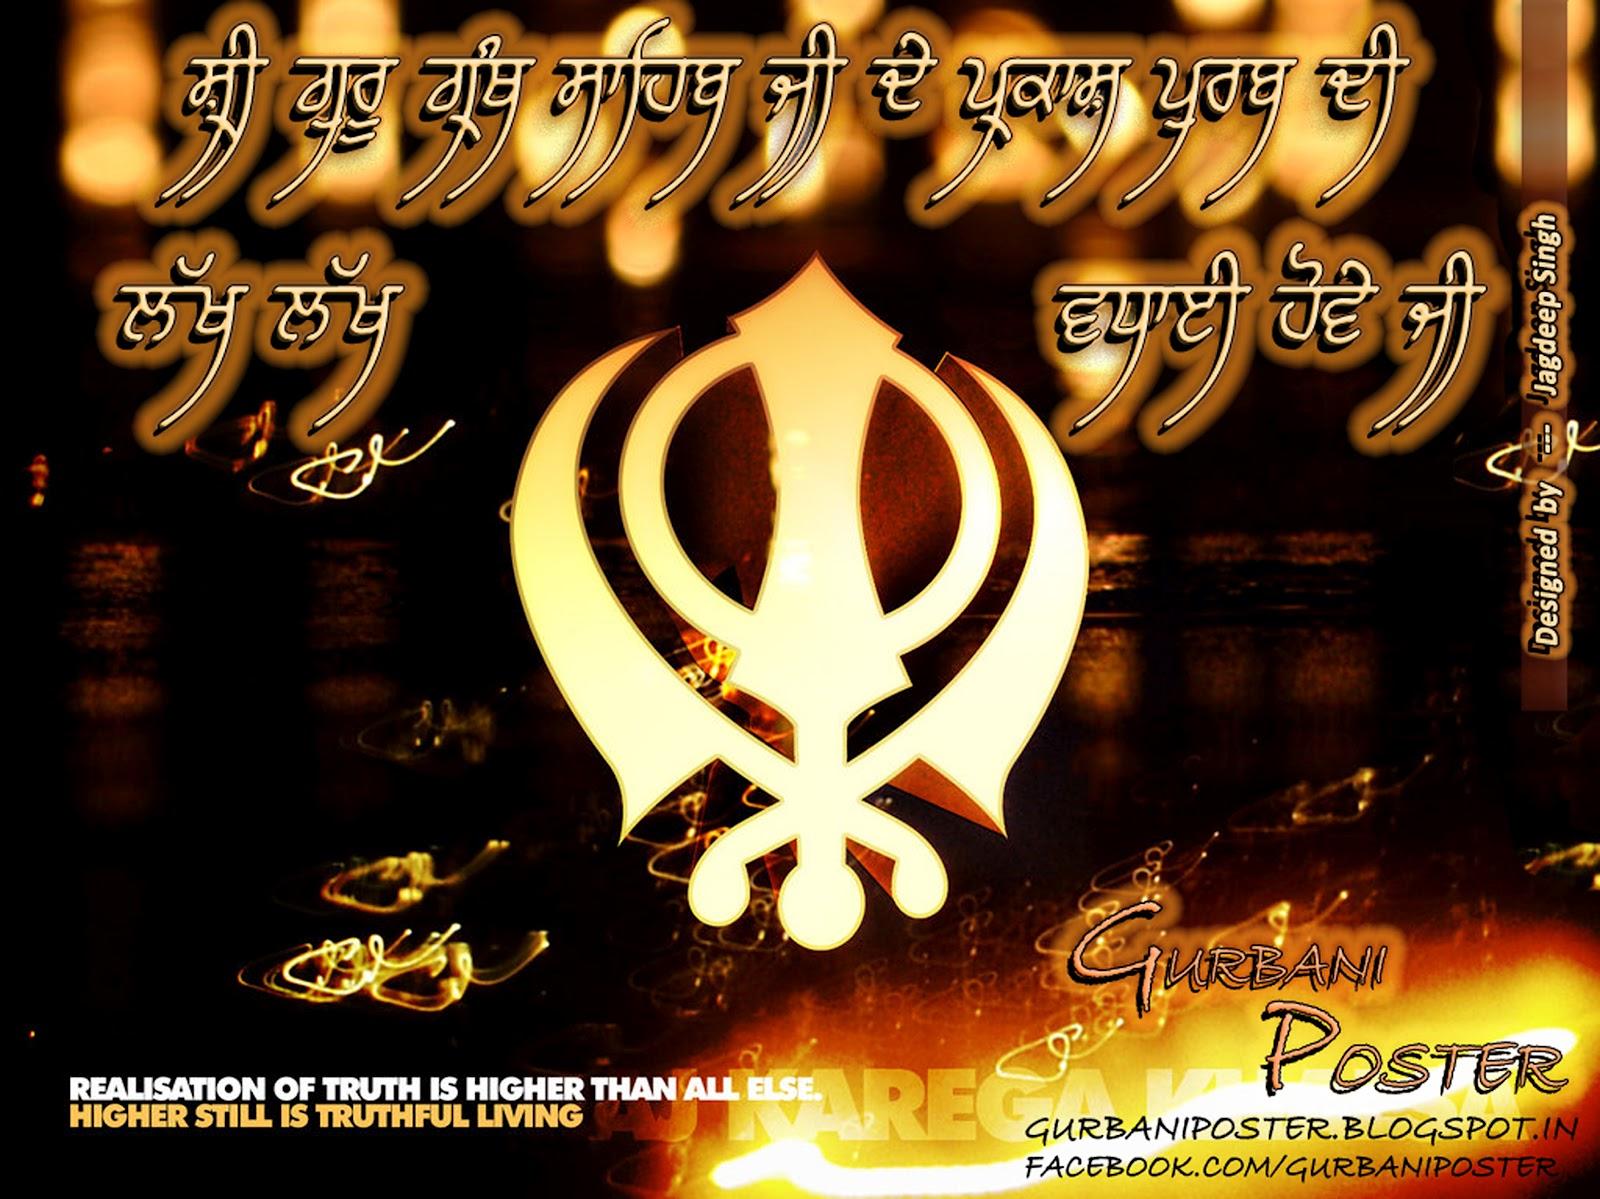 http://4.bp.blogspot.com/-pND4u9rCmyM/UEEAxCiOmJI/AAAAAAAAAJ8/nvOpsyJgrII/s1600/Sikh_Khanda_Wallpaper_by_jagdeep_singh5.jpg